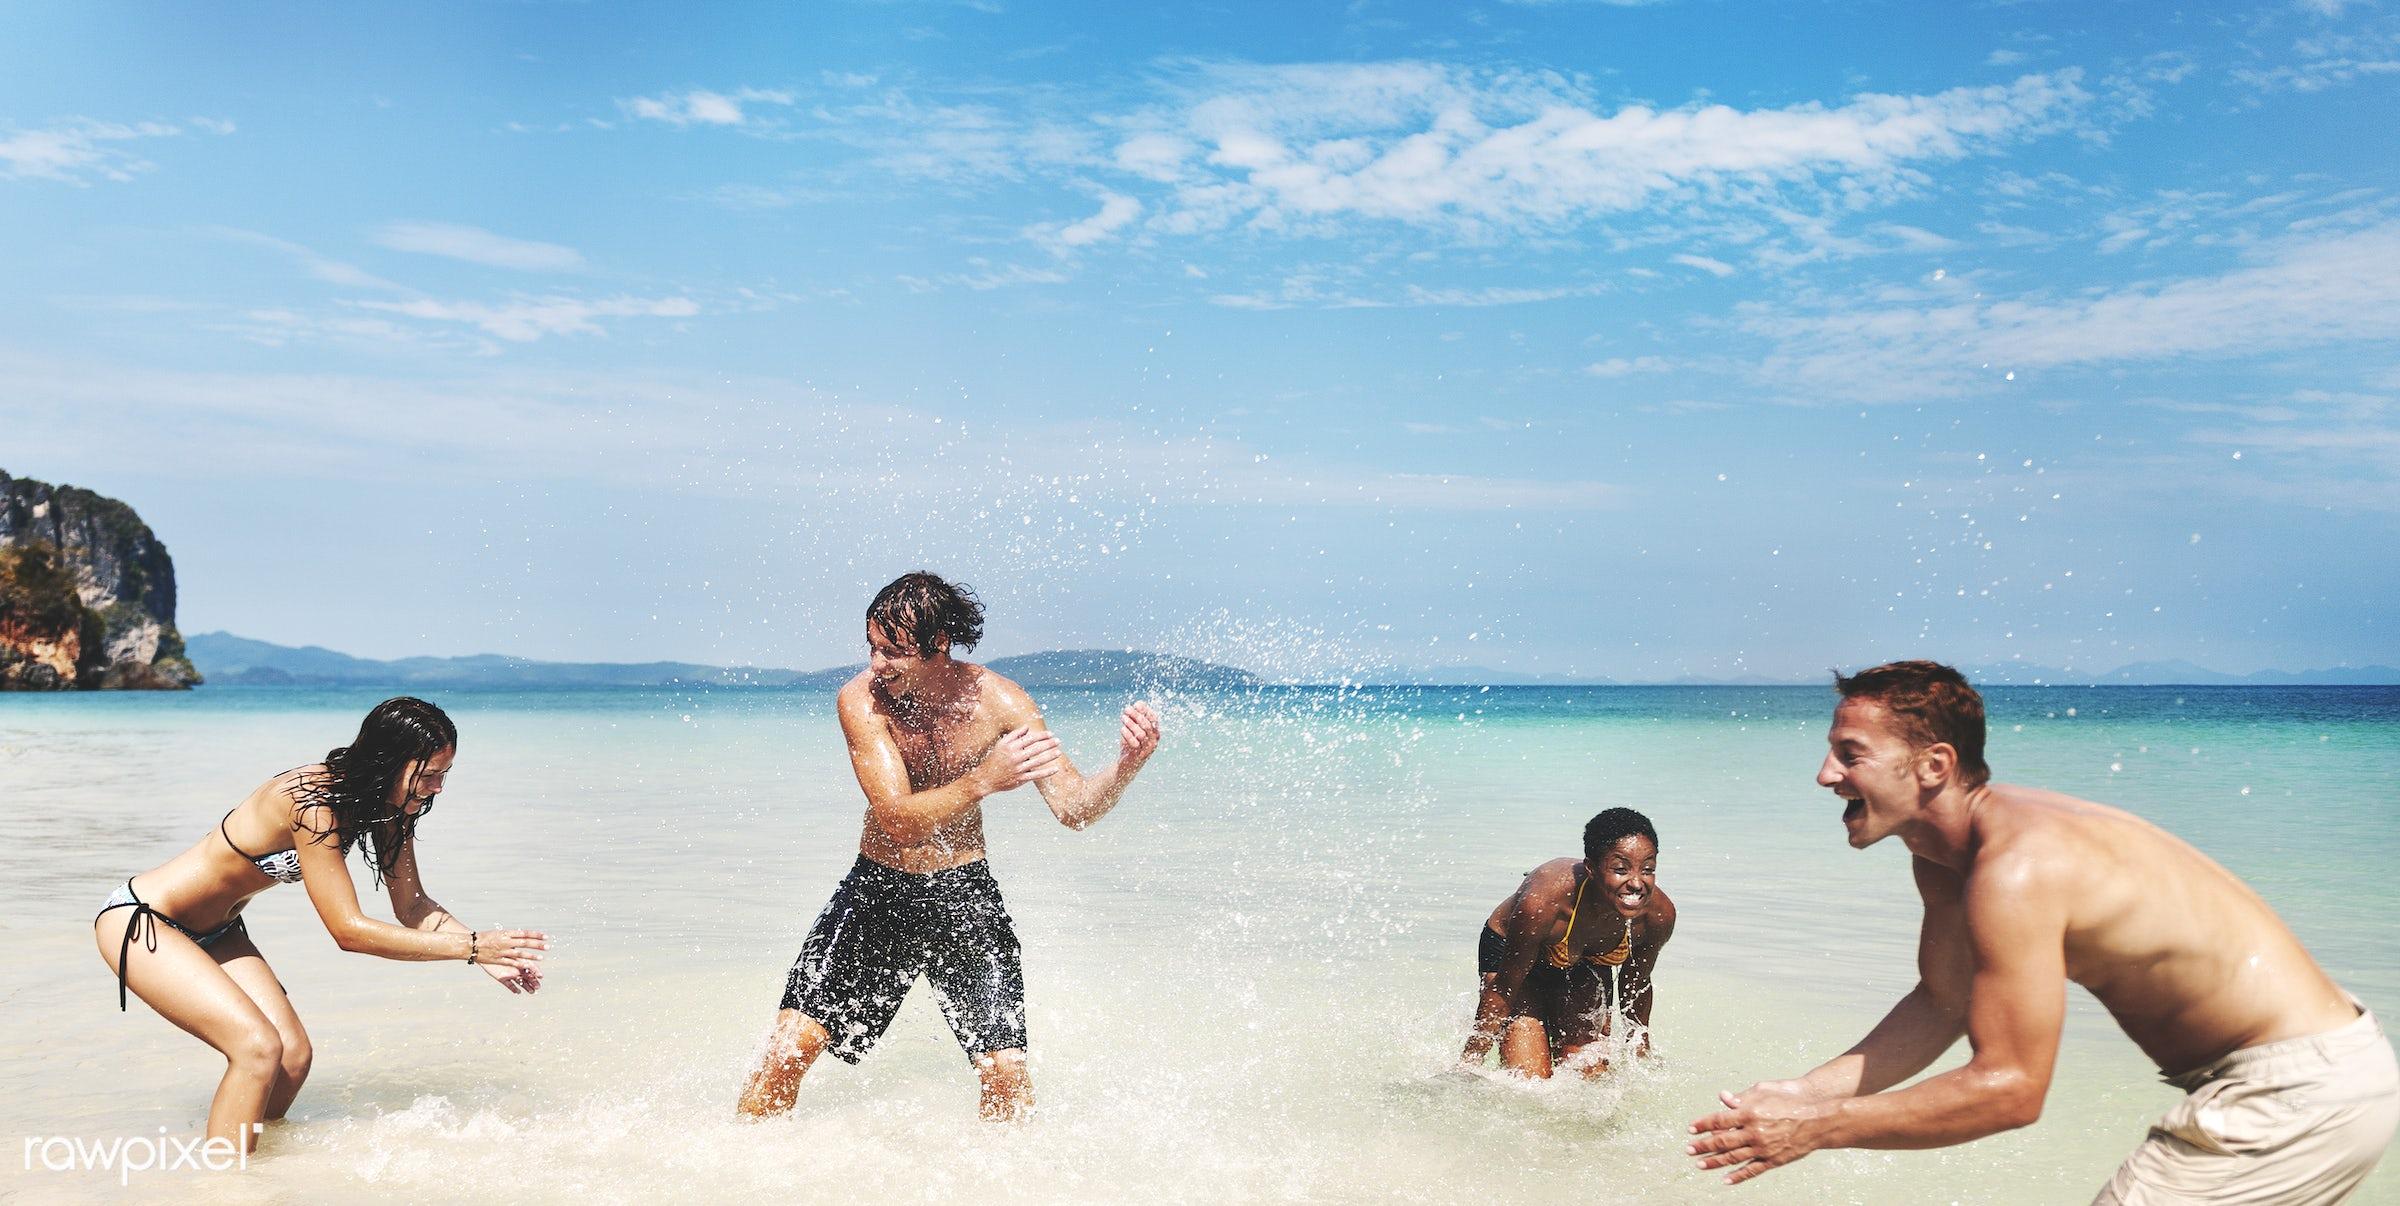 diverse, tropical, ocean, beach, people, playing, sky, friends, cheerful, water, enjoying, sea, leisure, fun, holiday,...